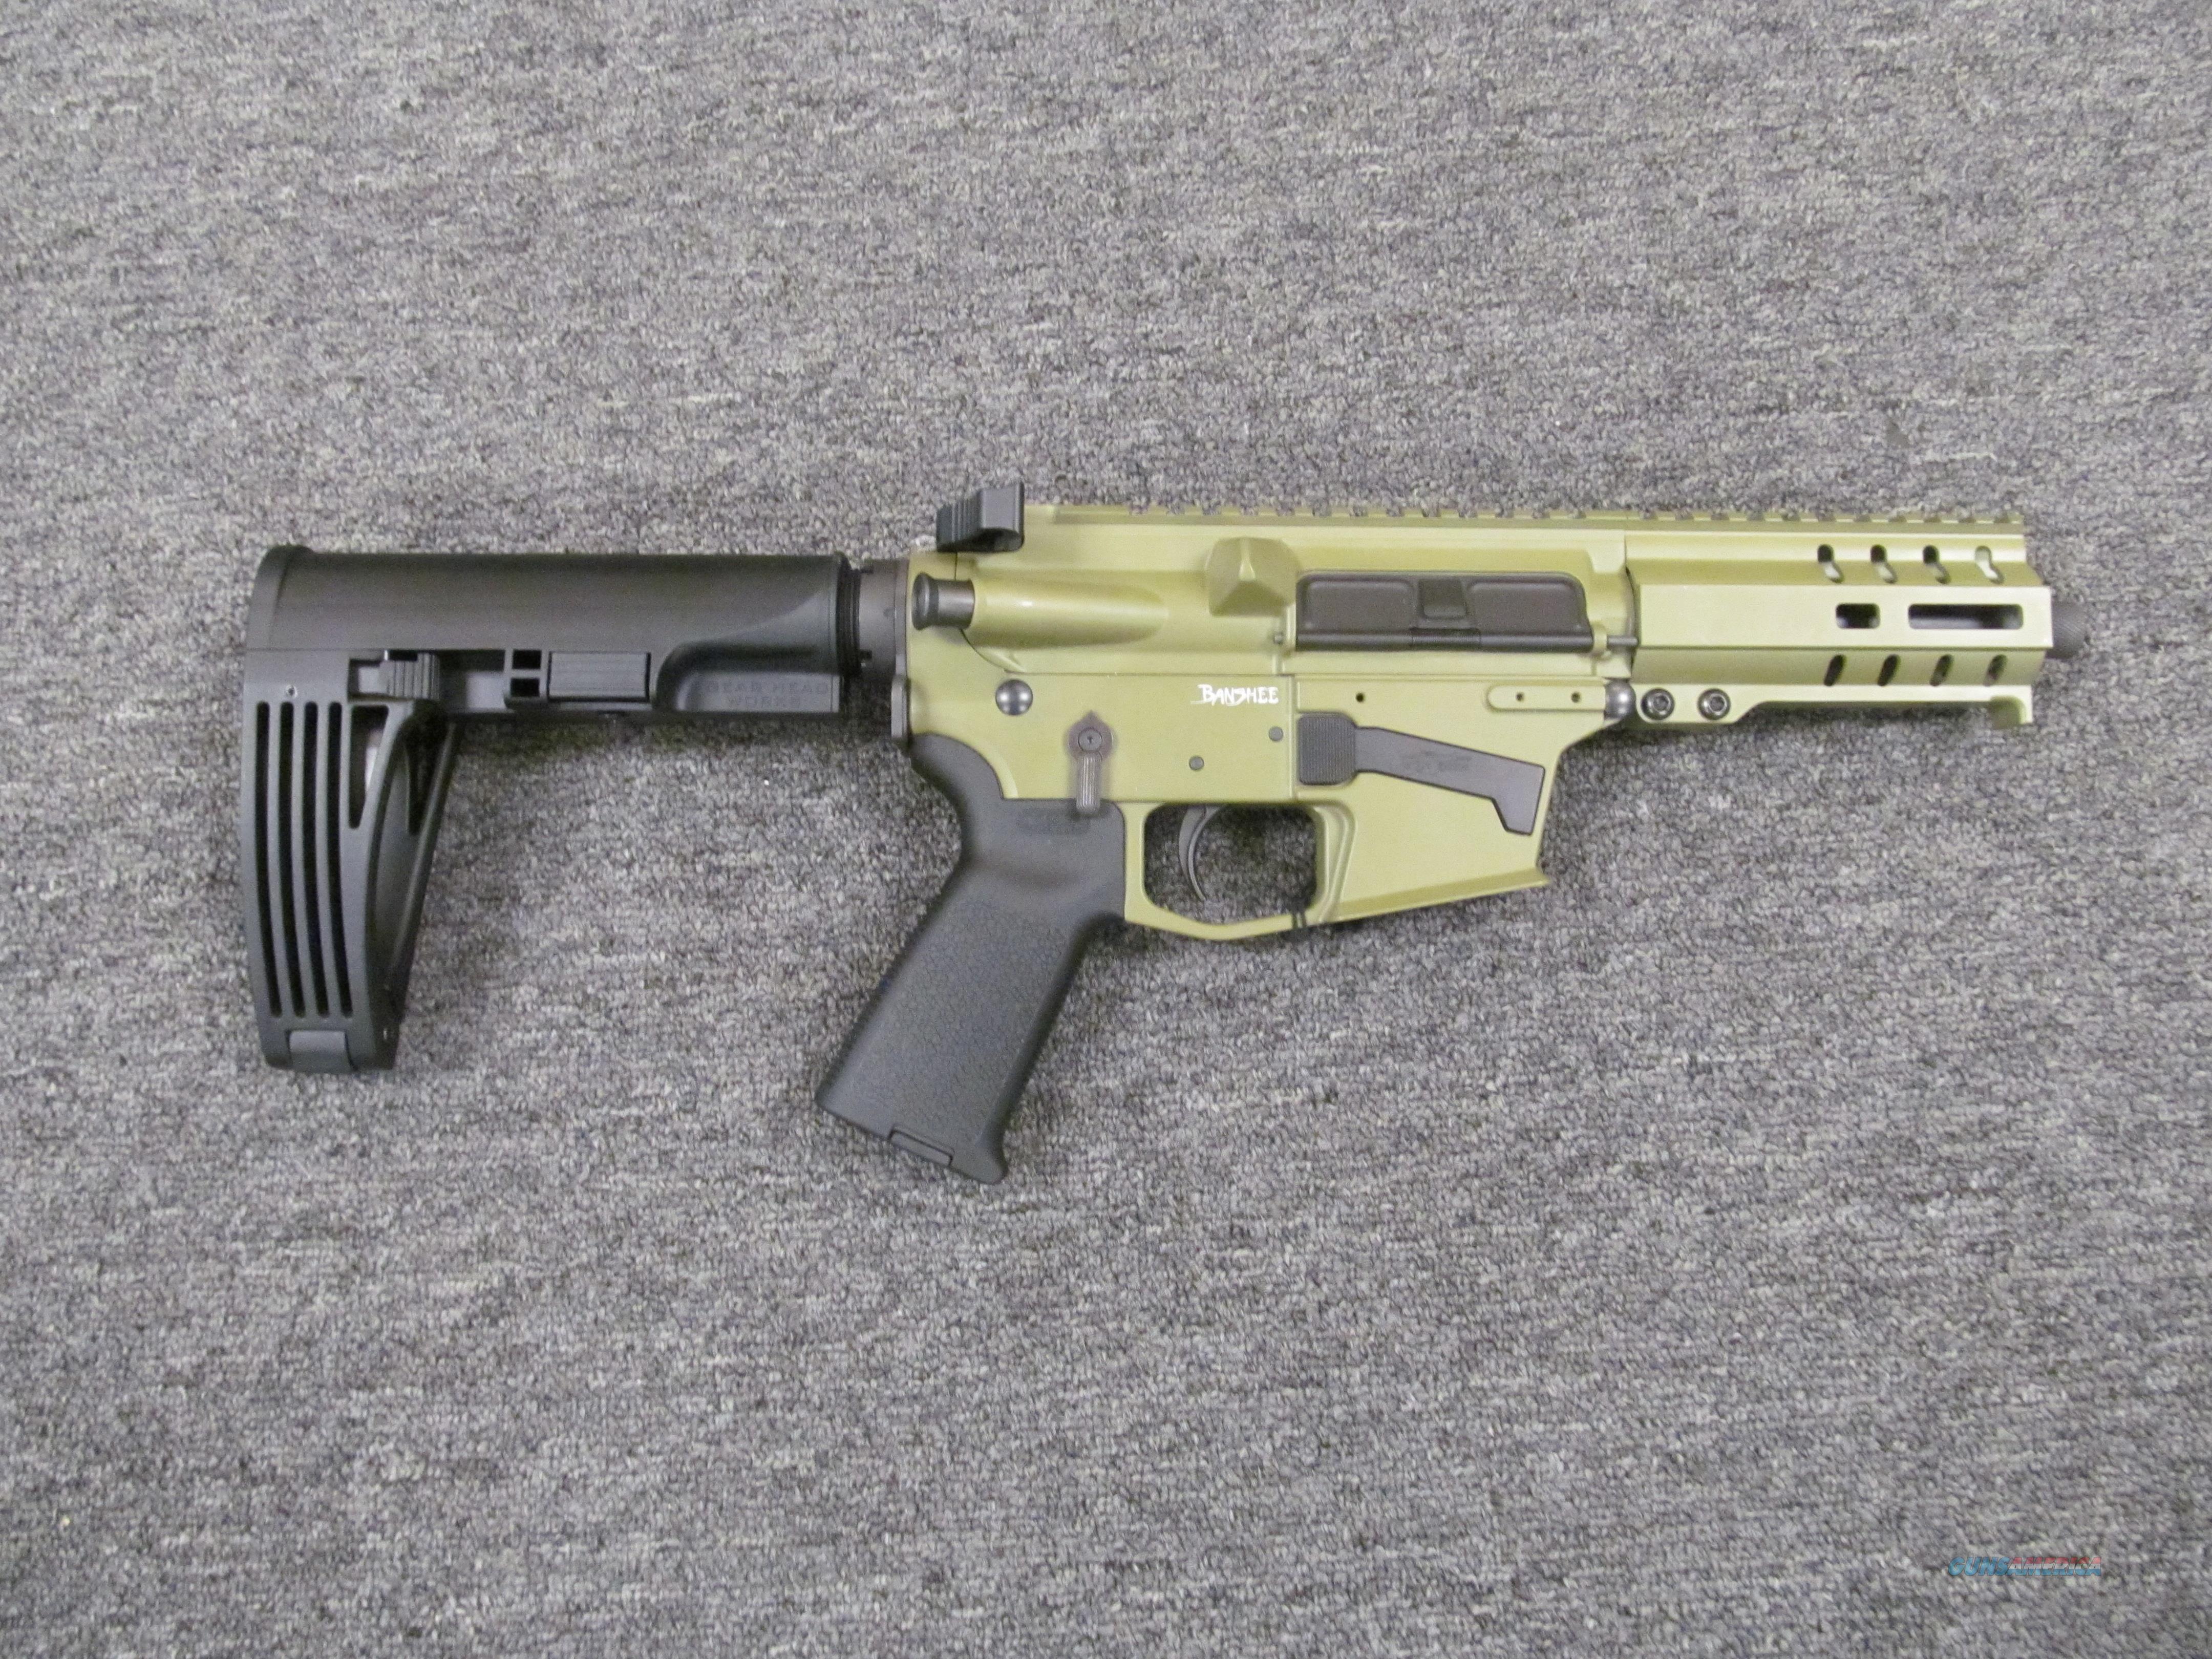 CMMG MK57 Banshee w/Green Finish  Guns > Pistols > CMMG > CMMG Pistols